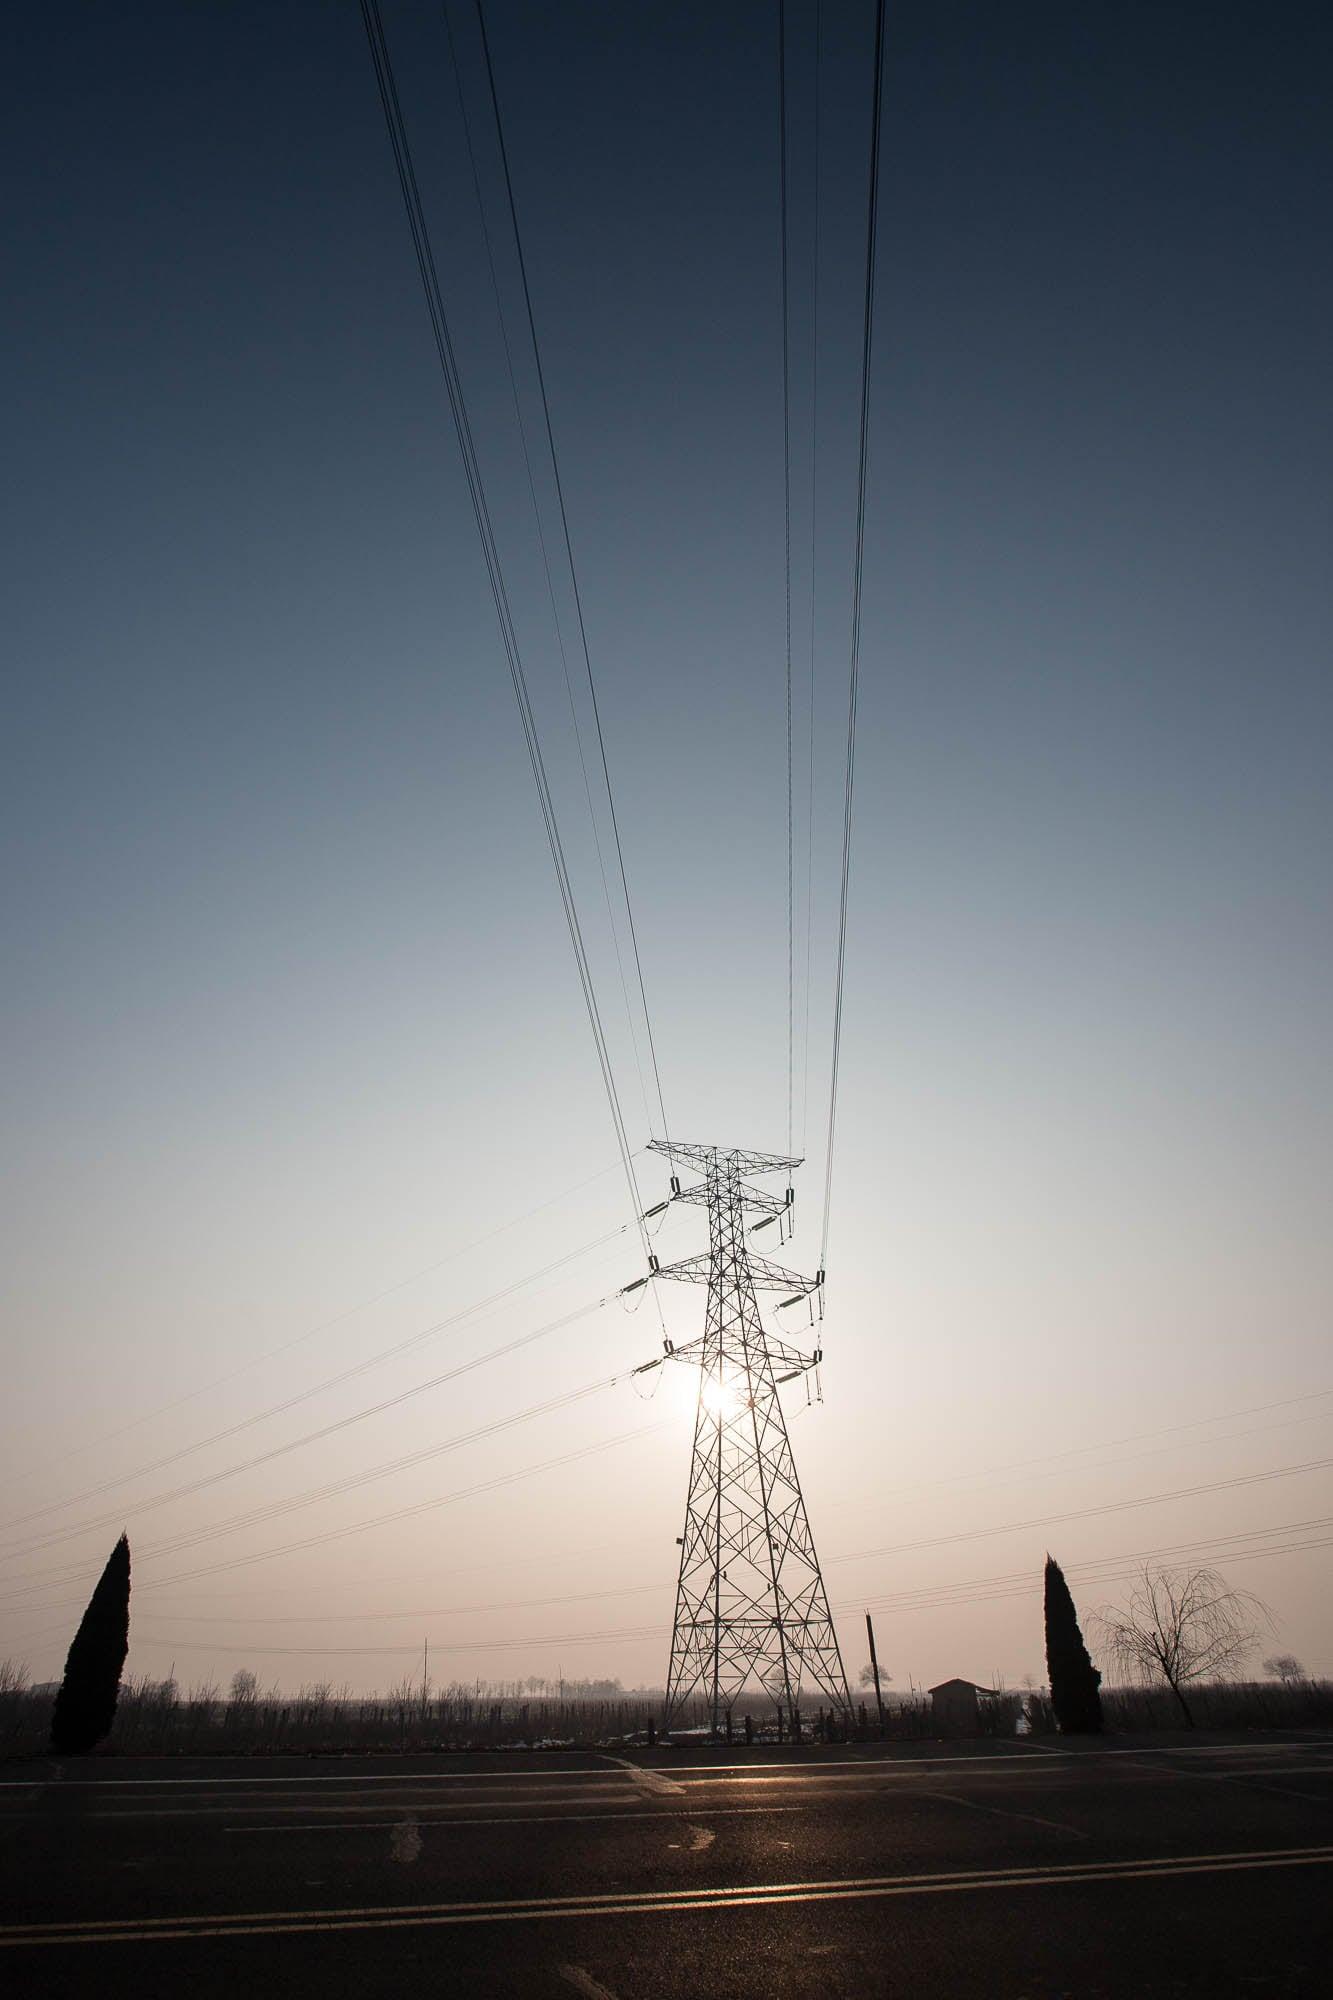 power lines backlight